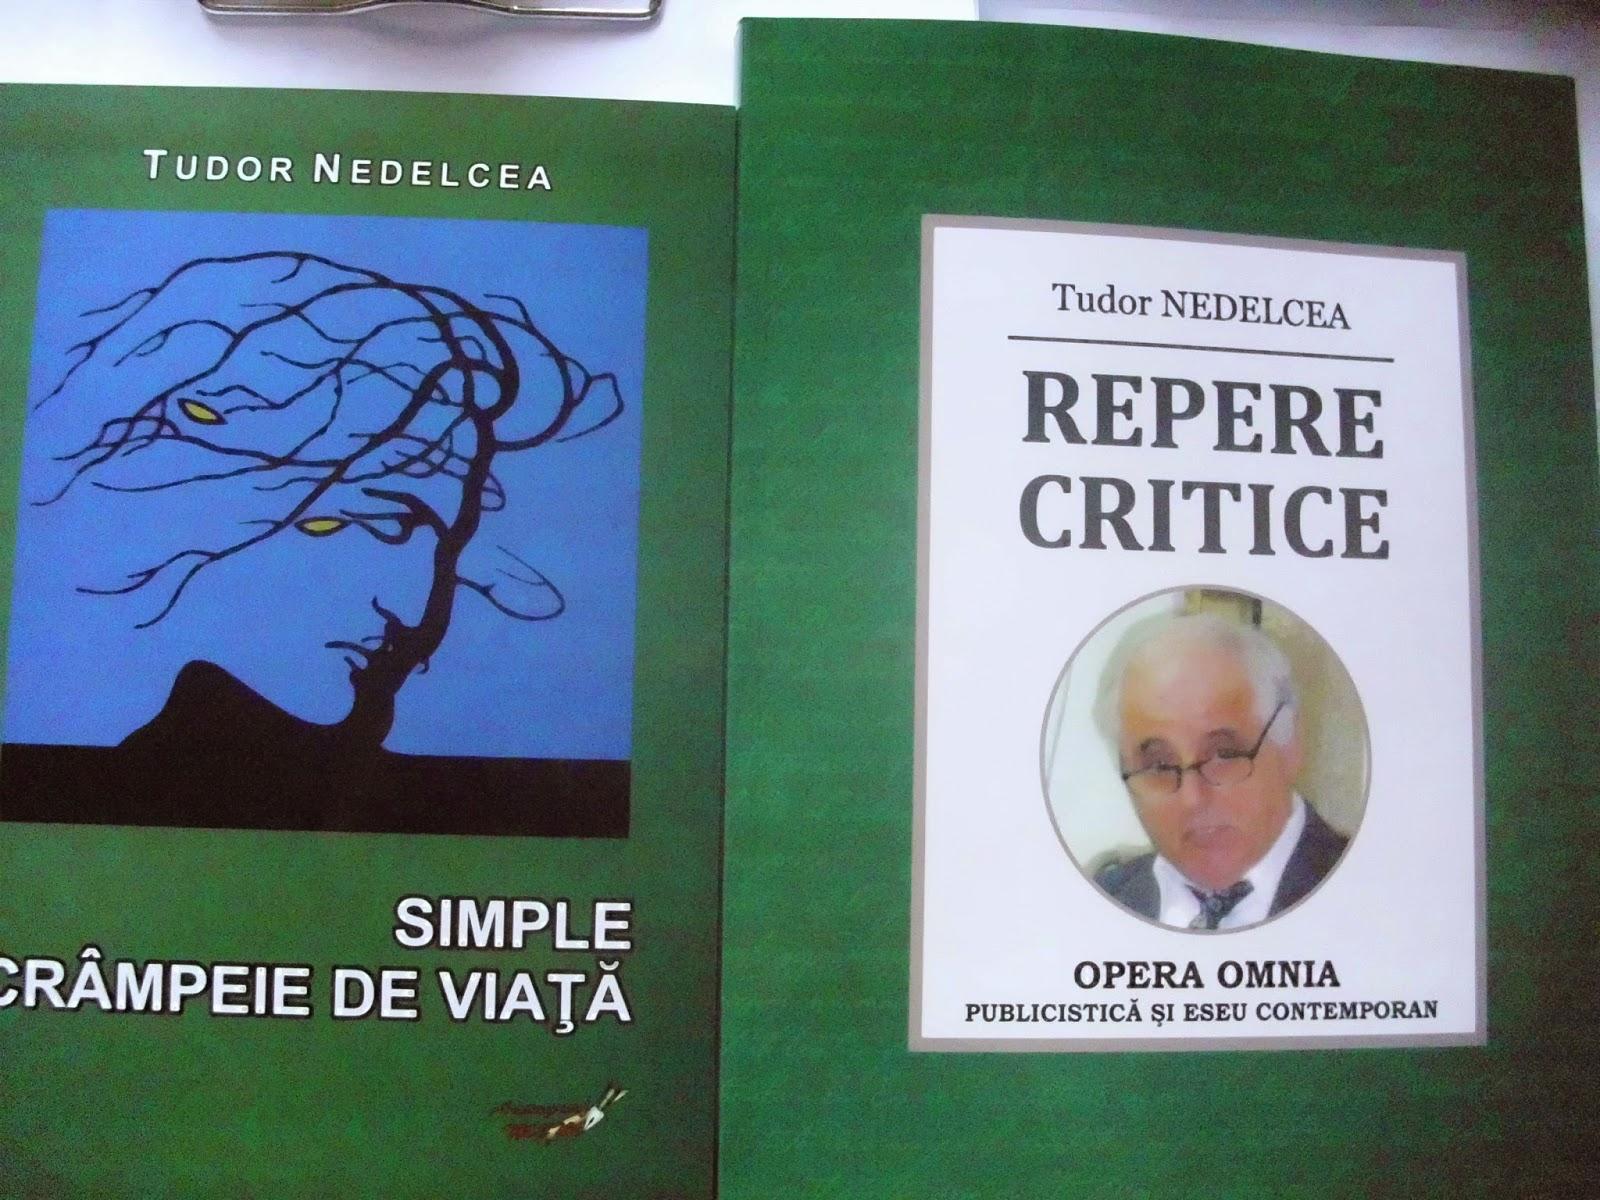 Tudor Nedelcea - Repere critice, Simple crampeie de viata